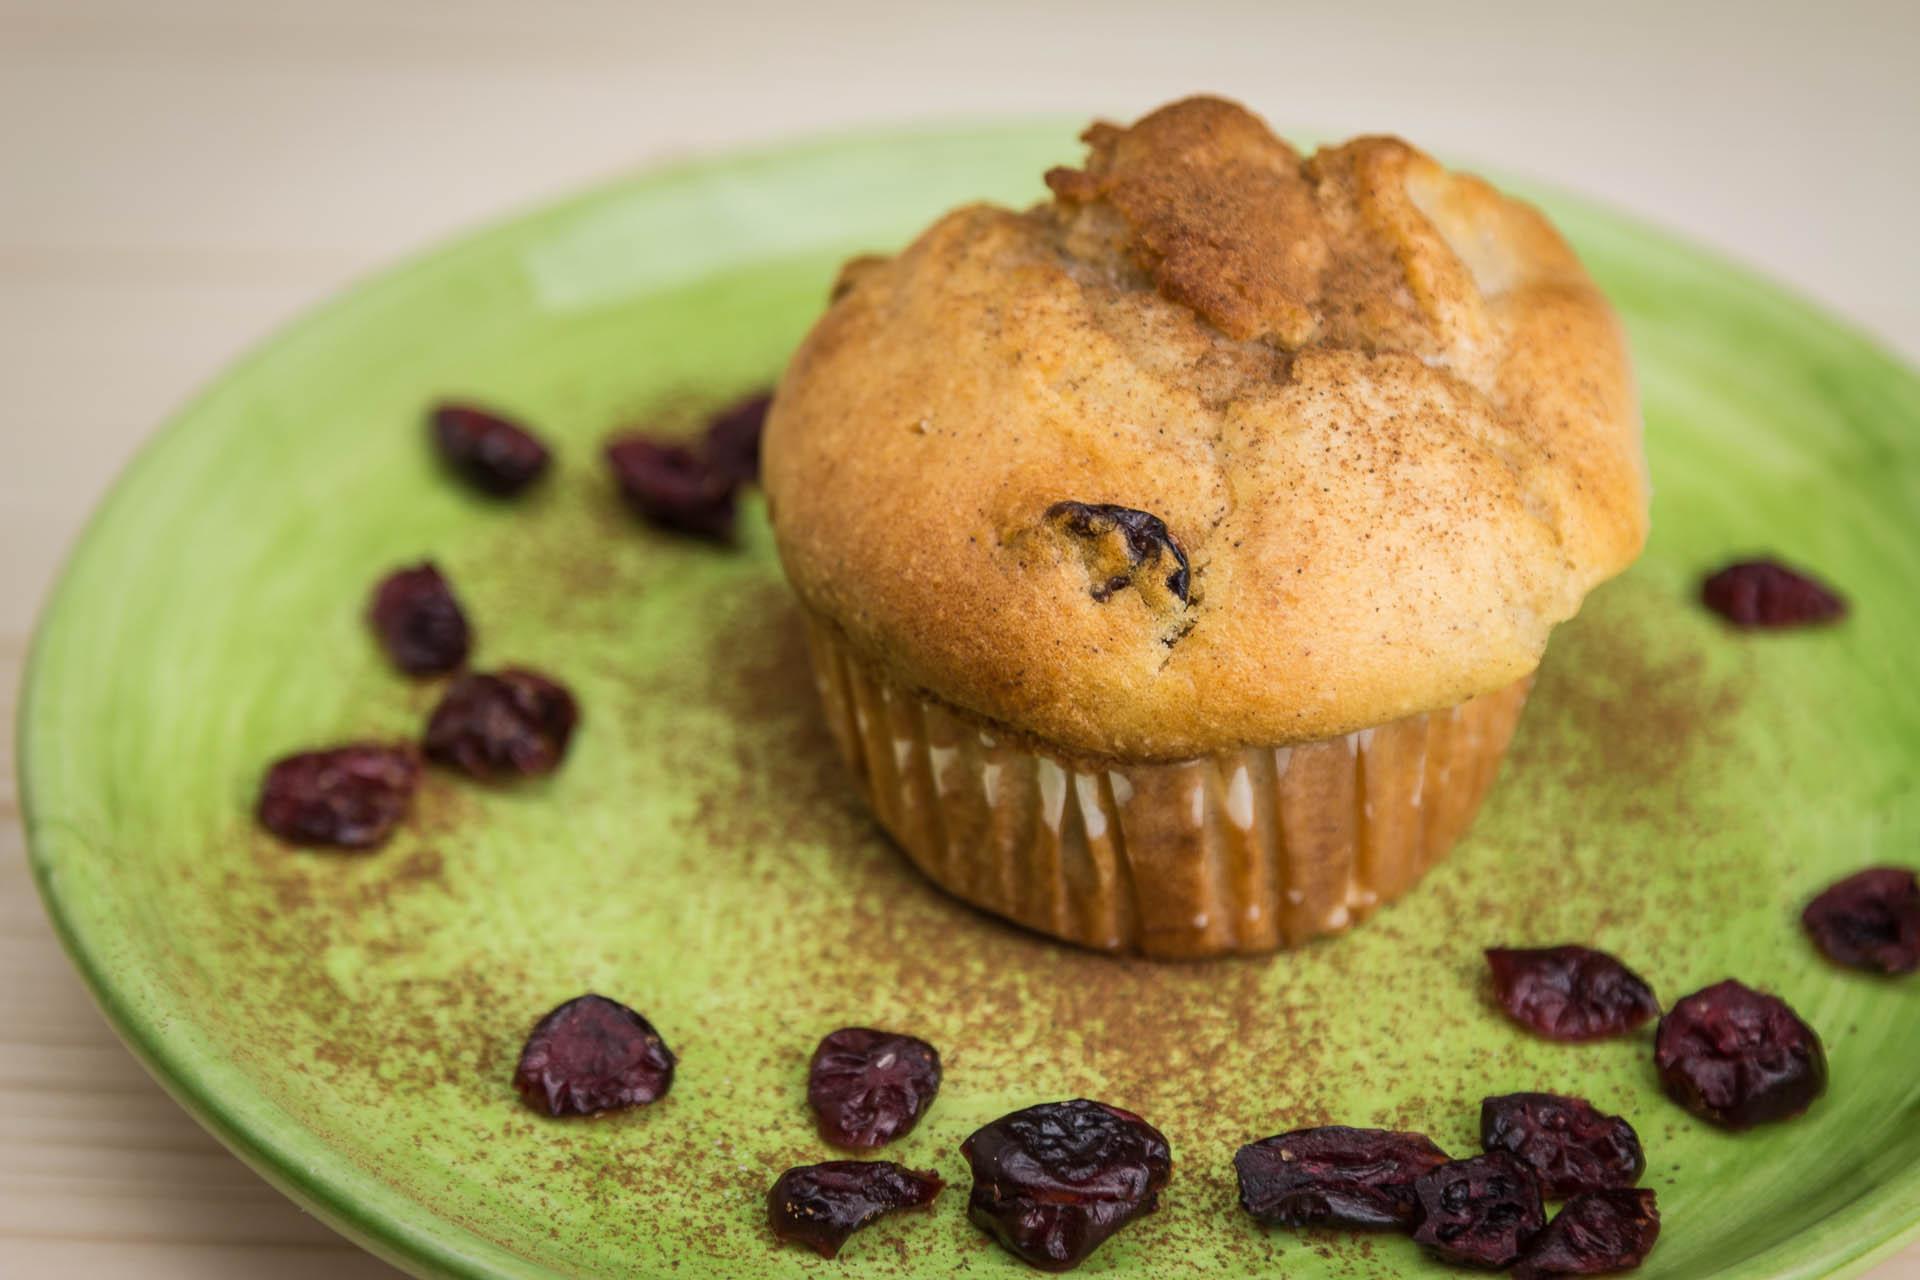 Muffins mele e mirtilli rossi